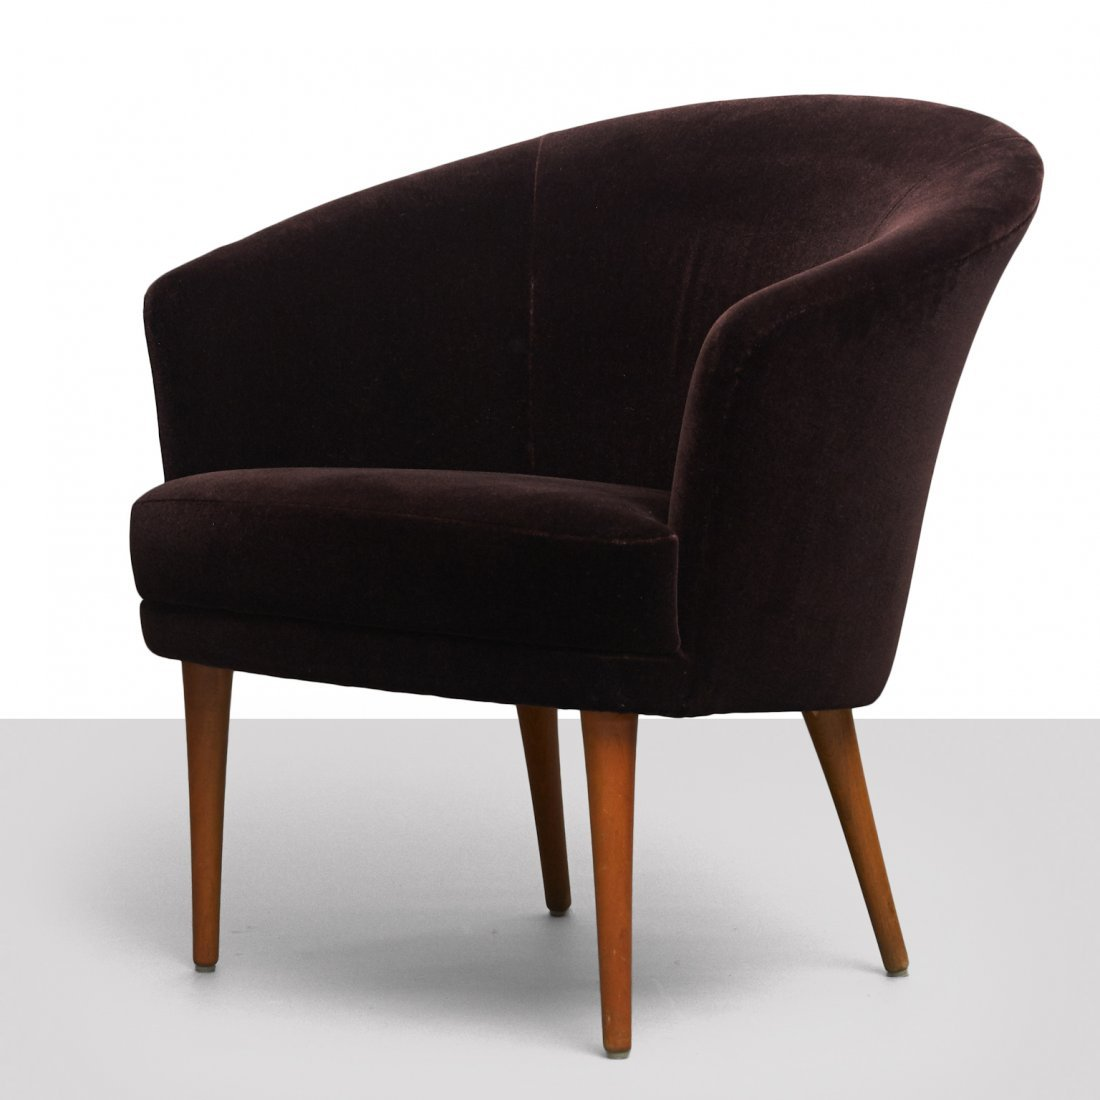 Rare Kerstin Horlin-Holmquist Lounge Chair for NK-Triva